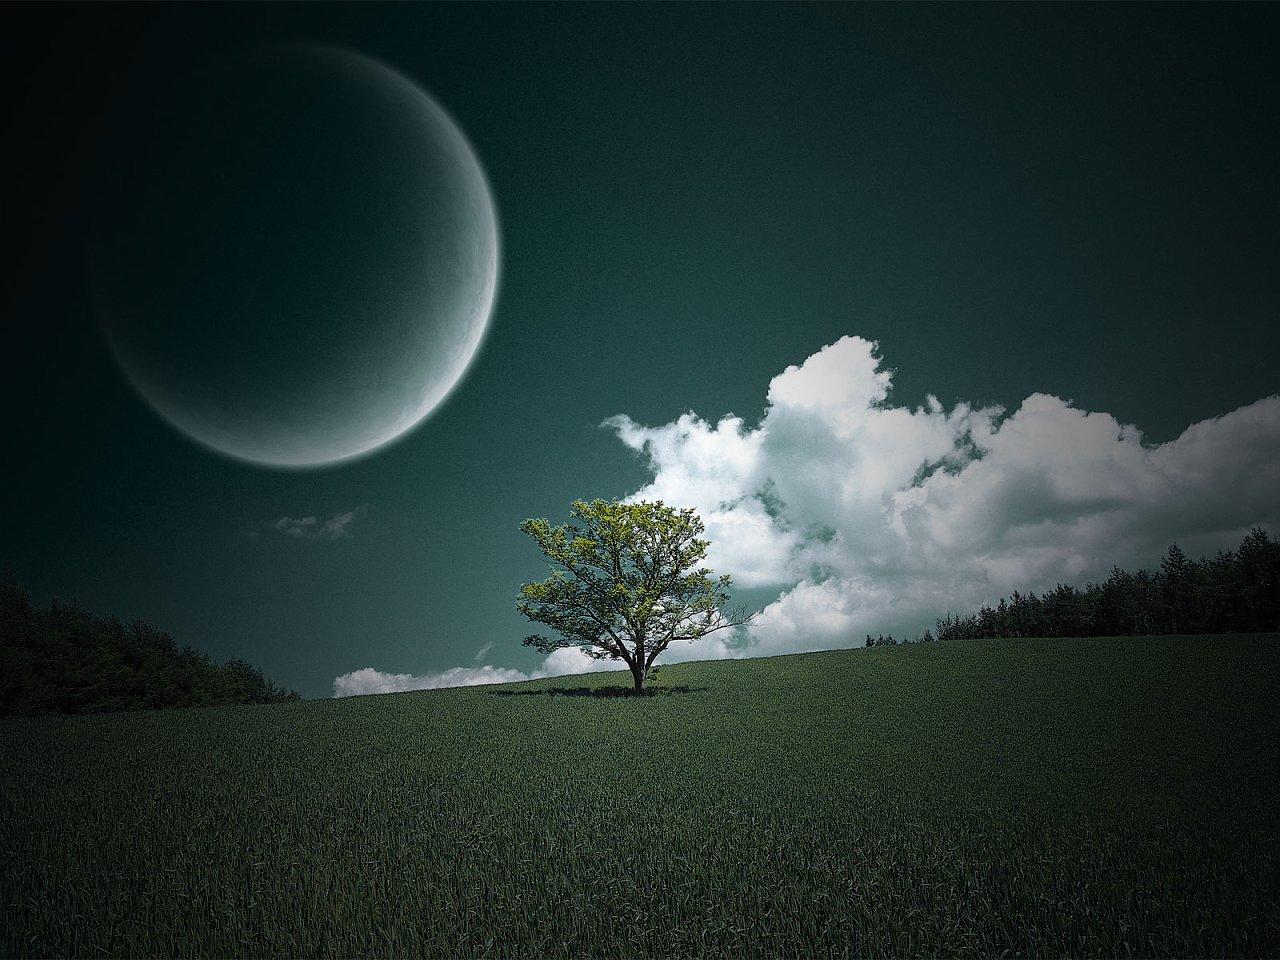 http://4.bp.blogspot.com/_GhlVI6dsgG8/TN6rhiJVFhI/AAAAAAAABHk/JpaykrDW6KQ/s1600/daylight%2Bplanet.jpg